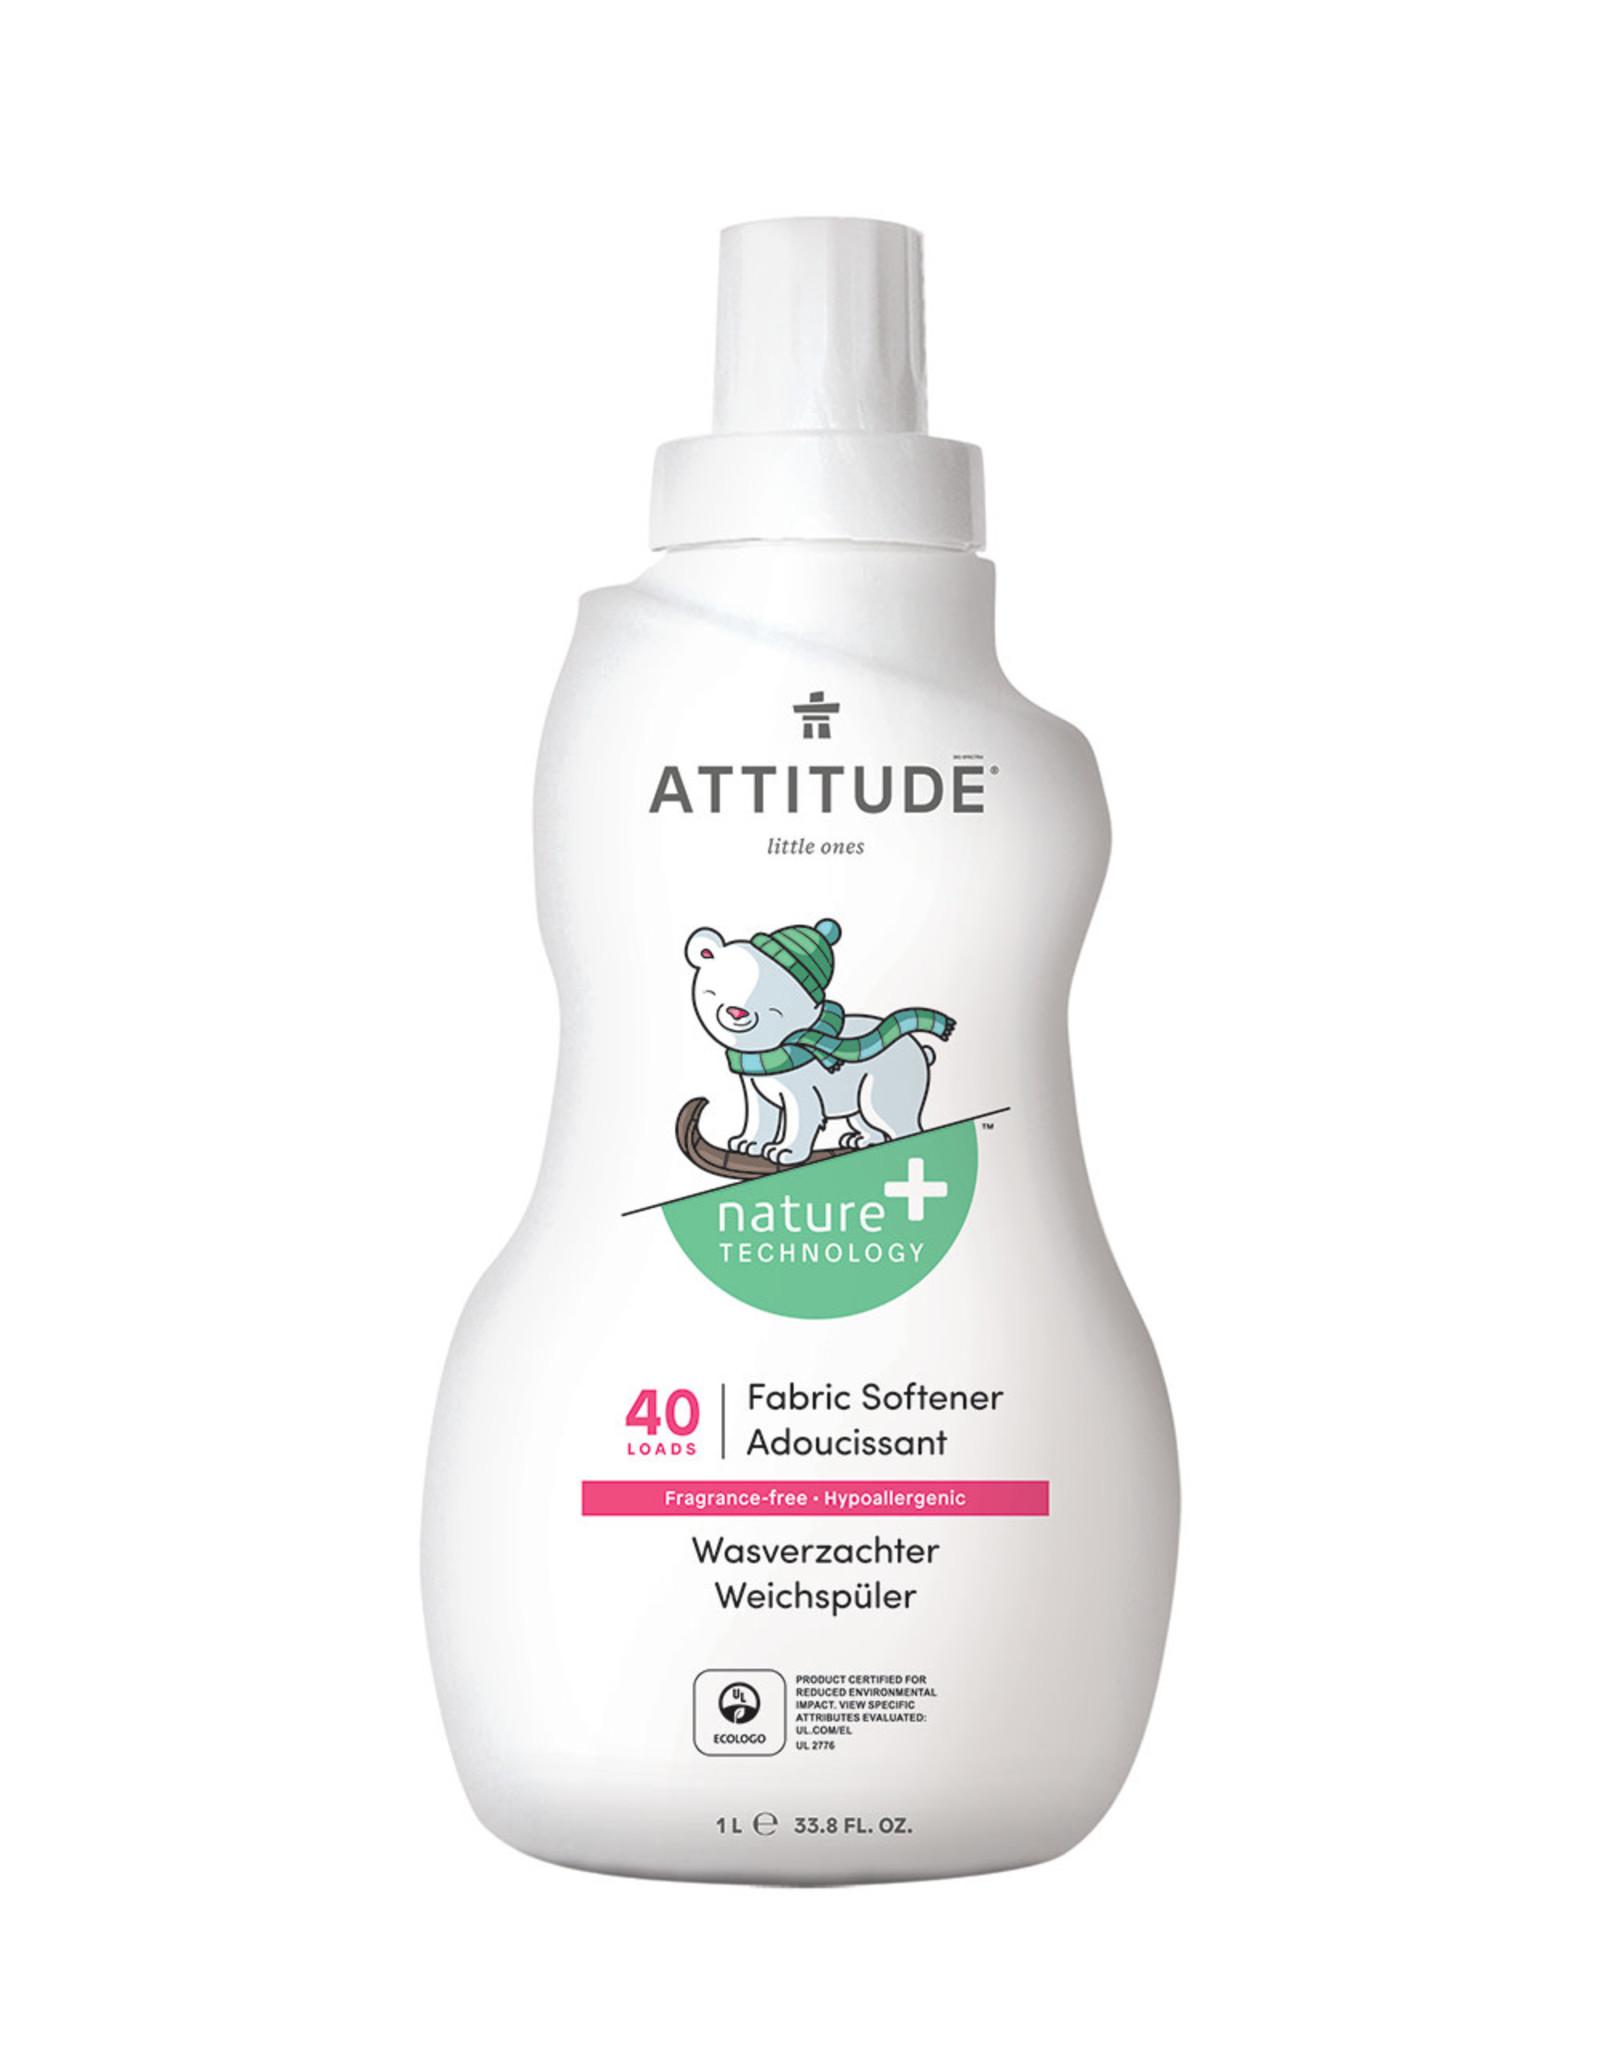 Attitude Attitude Little Ones   Wasverzachter   Parfumvrij